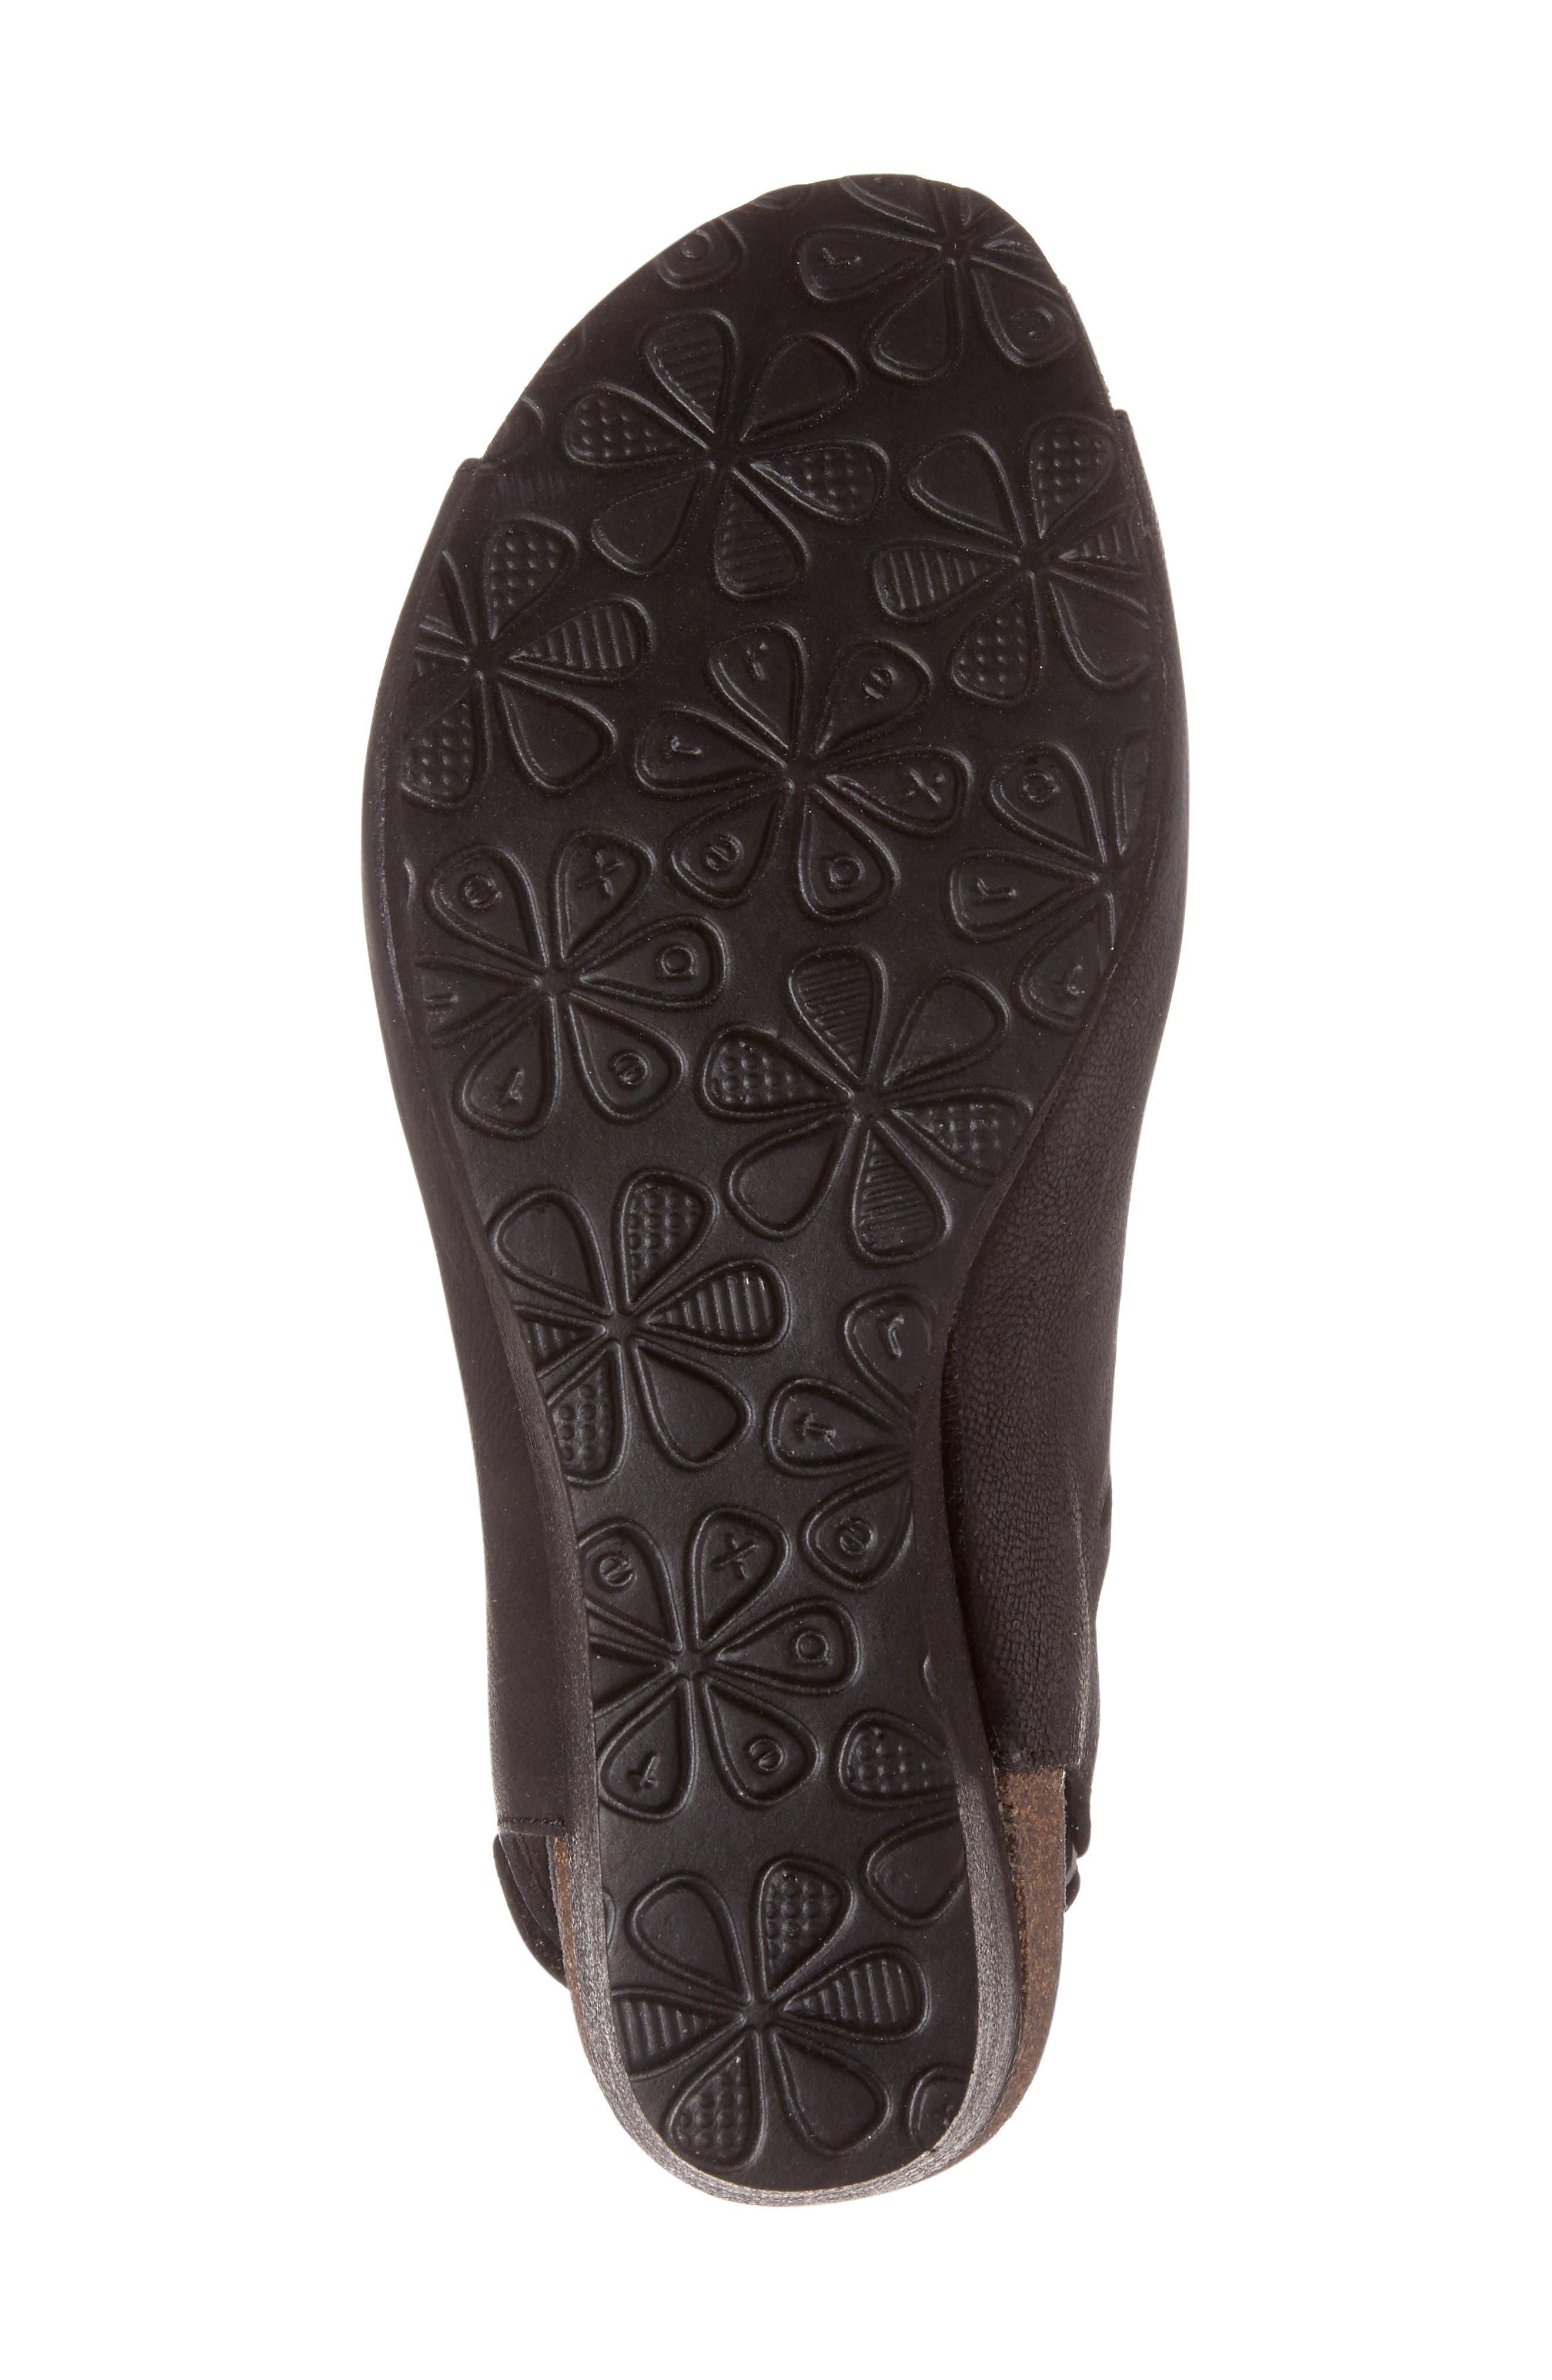 Giselle Slingback Wedge Sandal,                             Alternate thumbnail 6, color,                             Black Leather